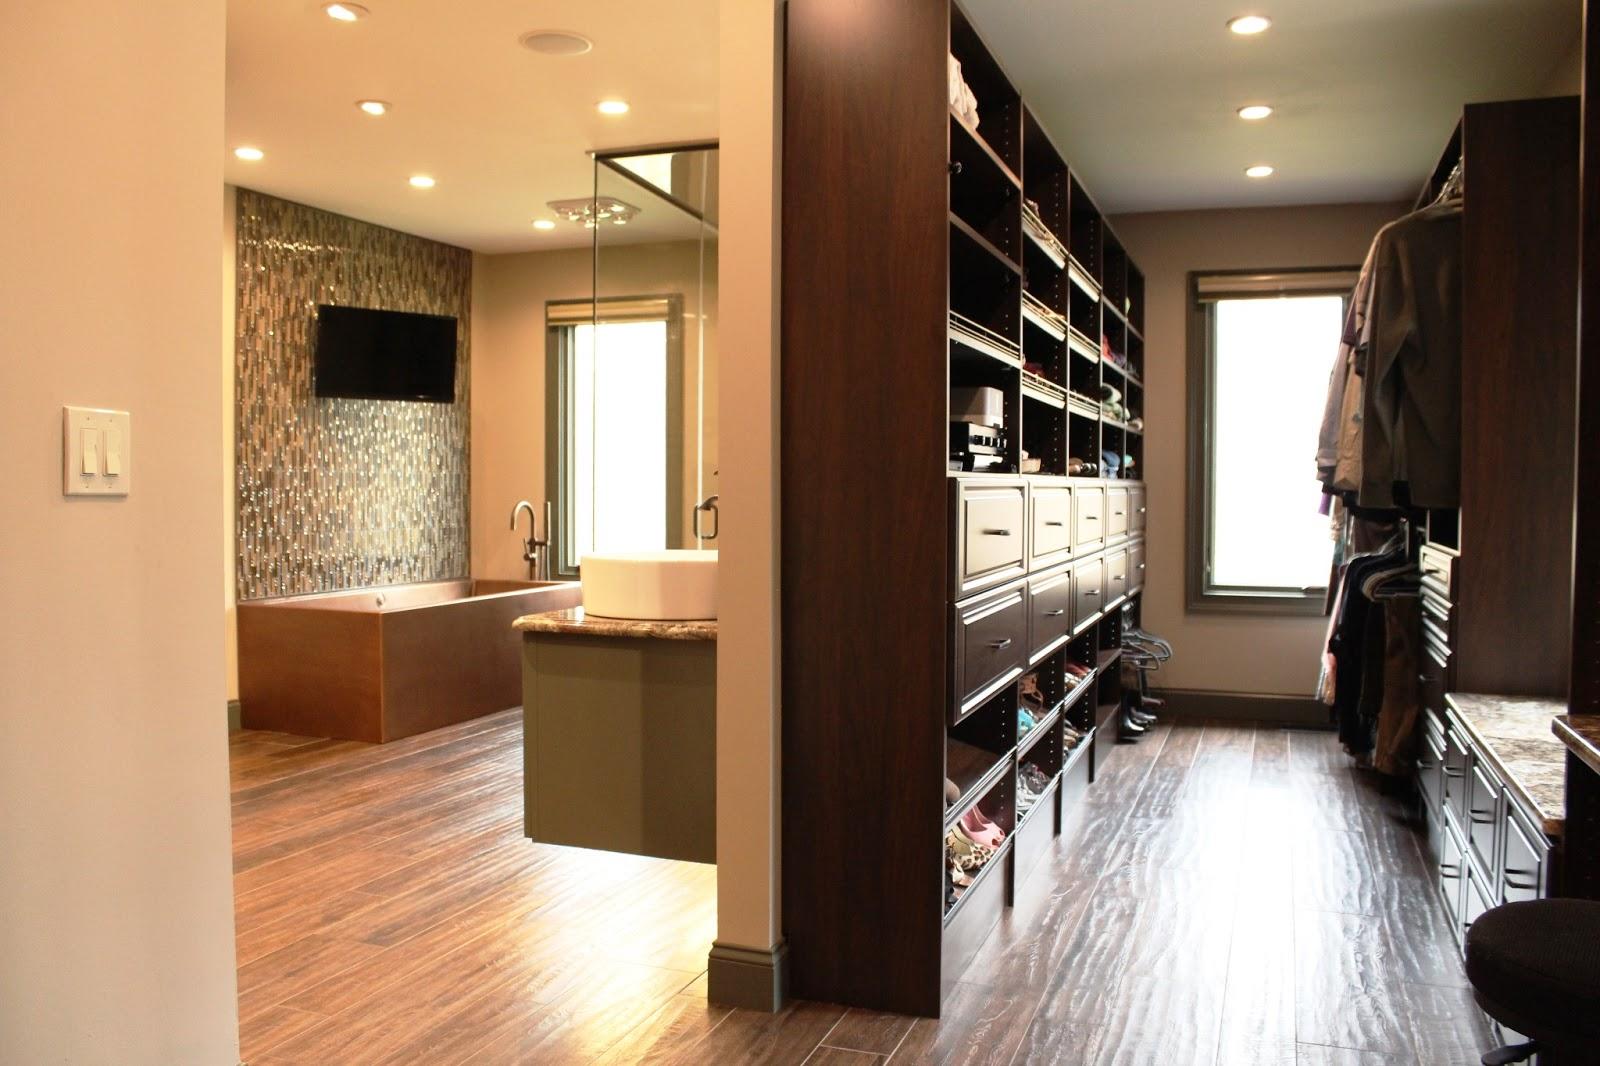 walk in closet and bathroom ideas photo - 4